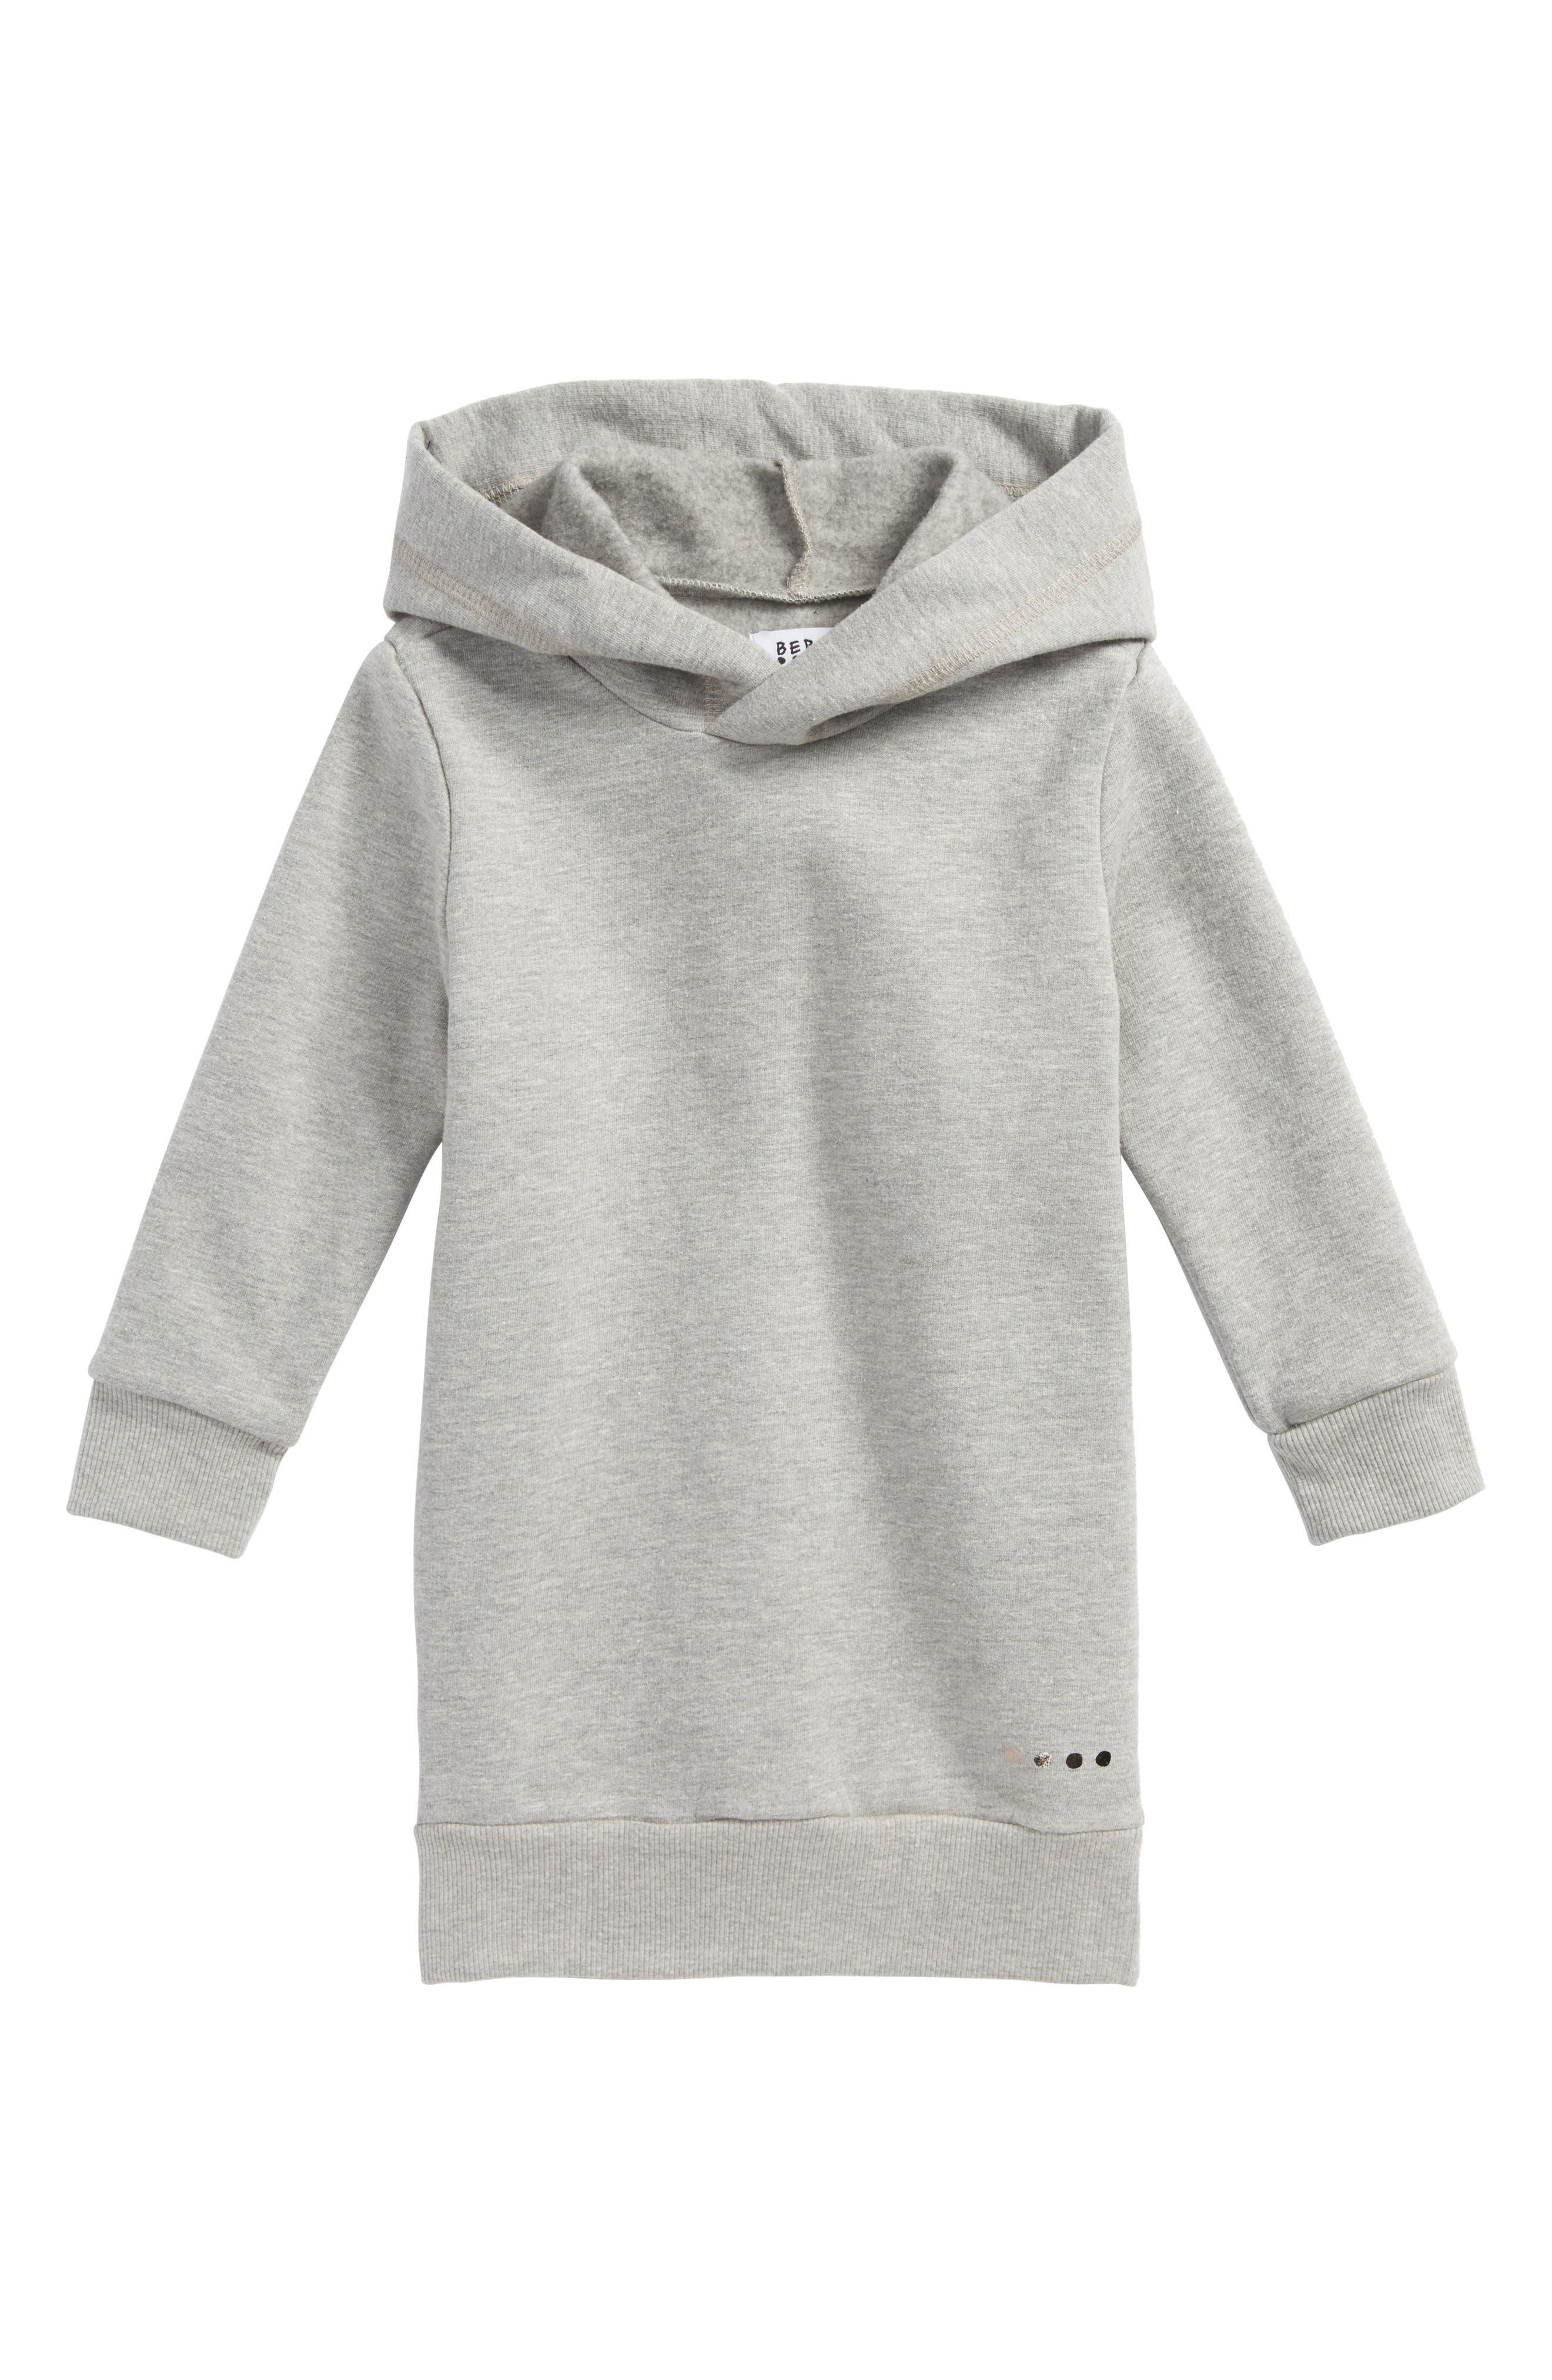 Luna Hooded Sweatshirt Dress,                             Main thumbnail 1, color,                             050